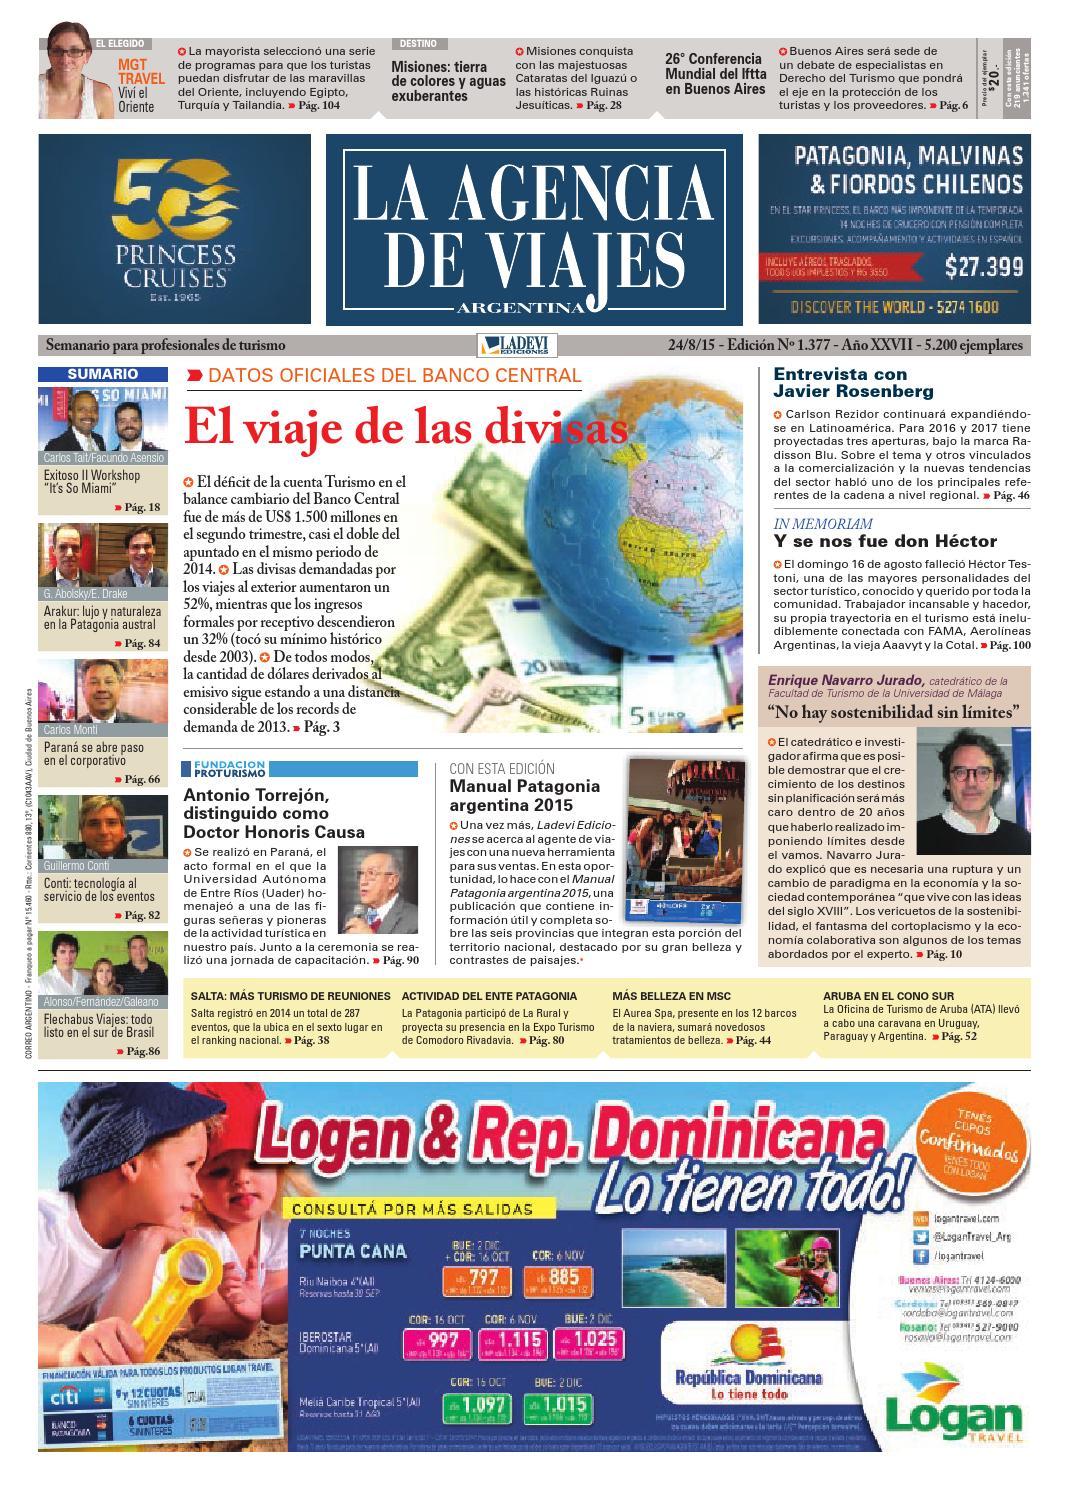 Alza casino México tragamonedas bombay para jugar gratis-159078